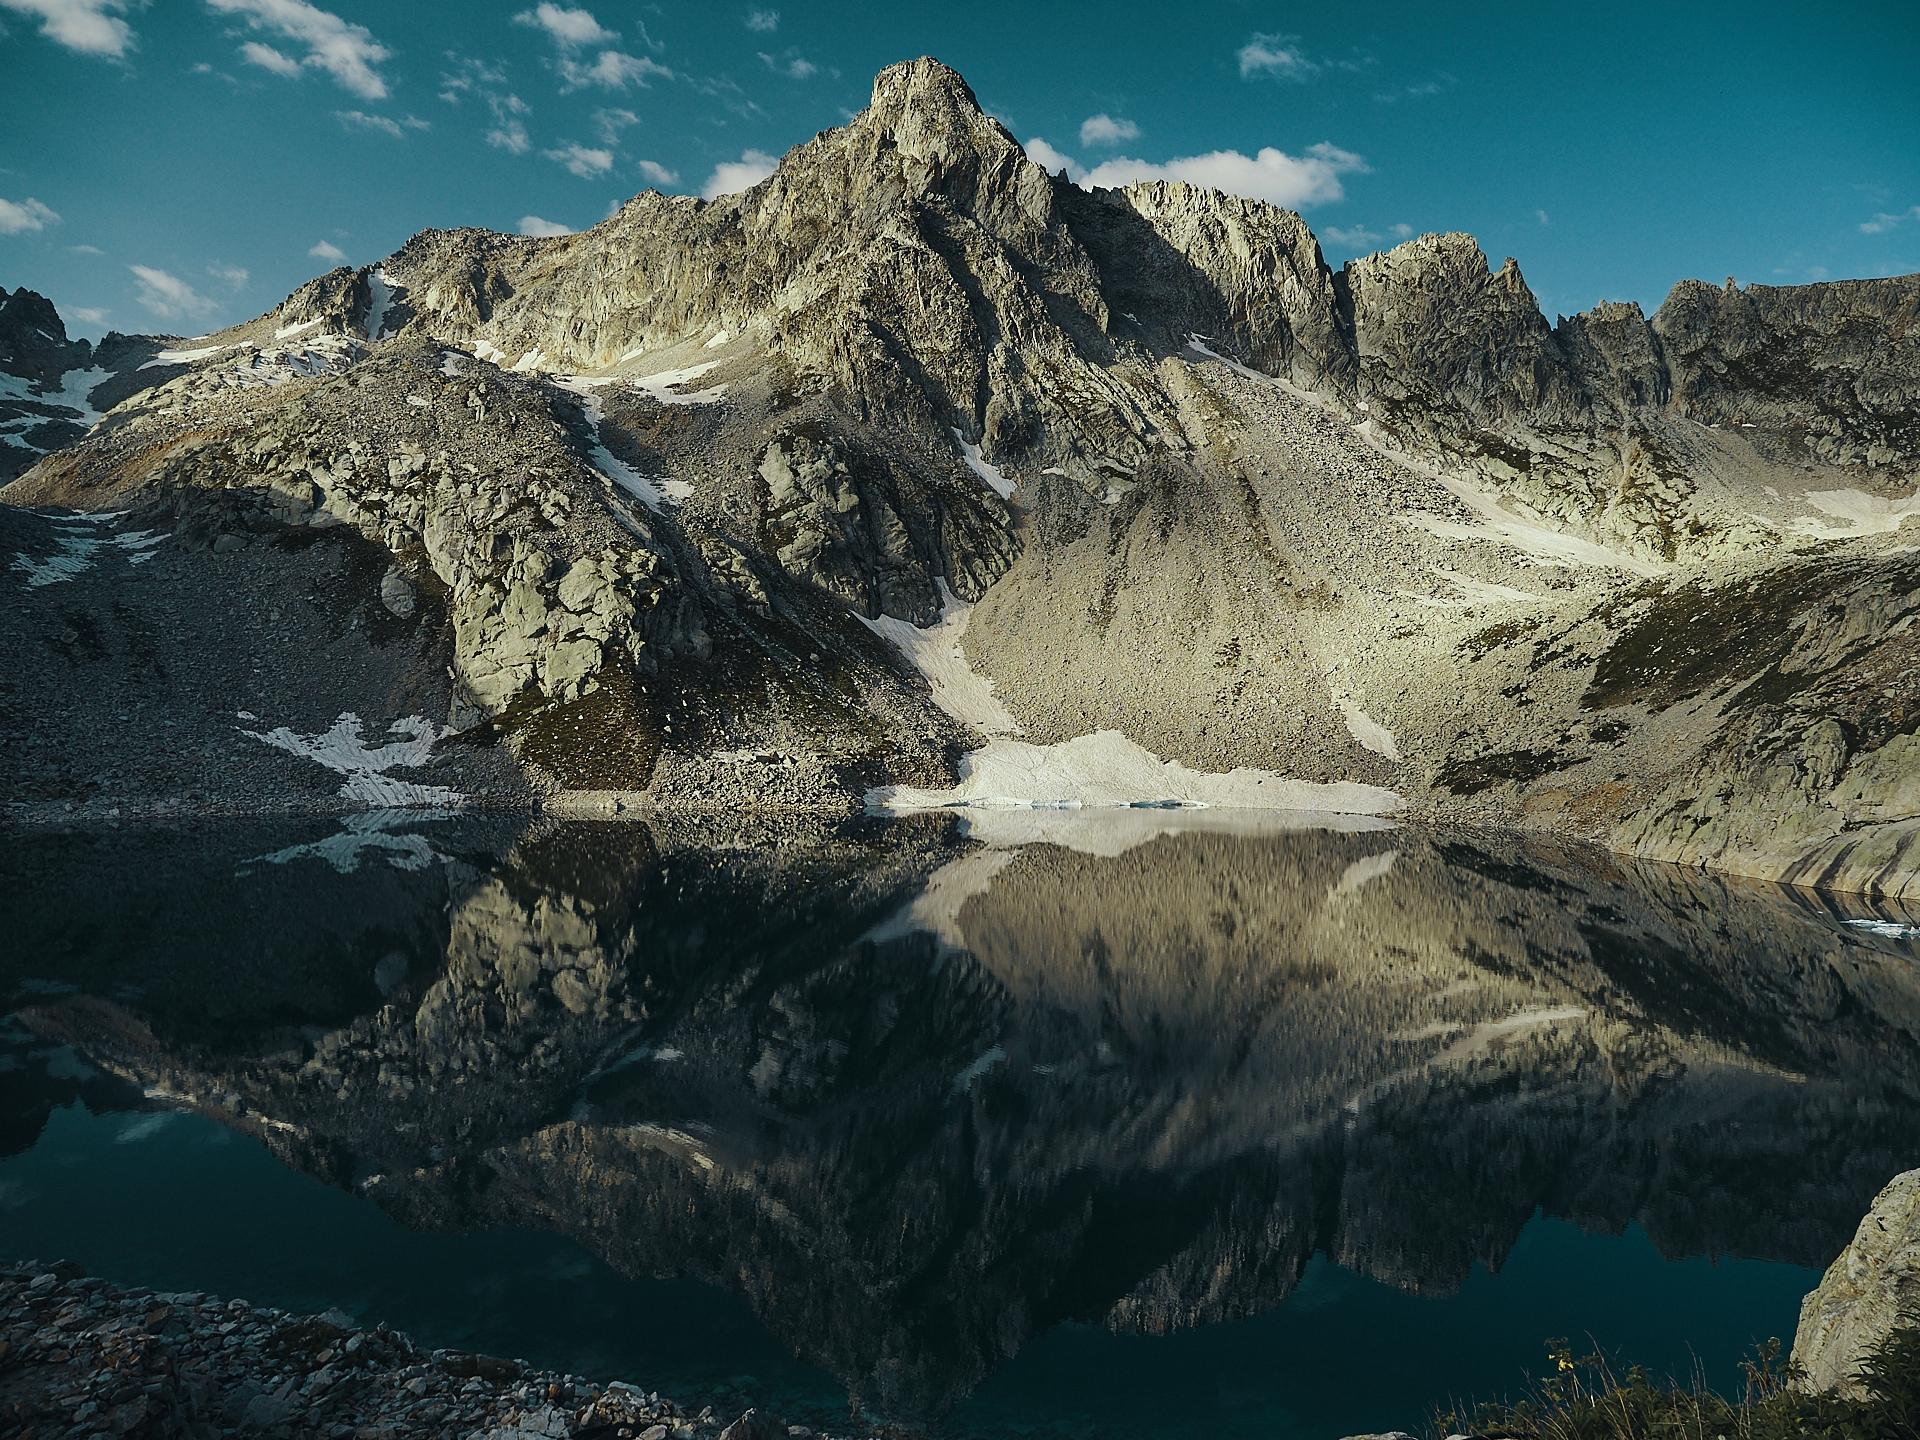 Parco delle Alpi Marittime, Italy